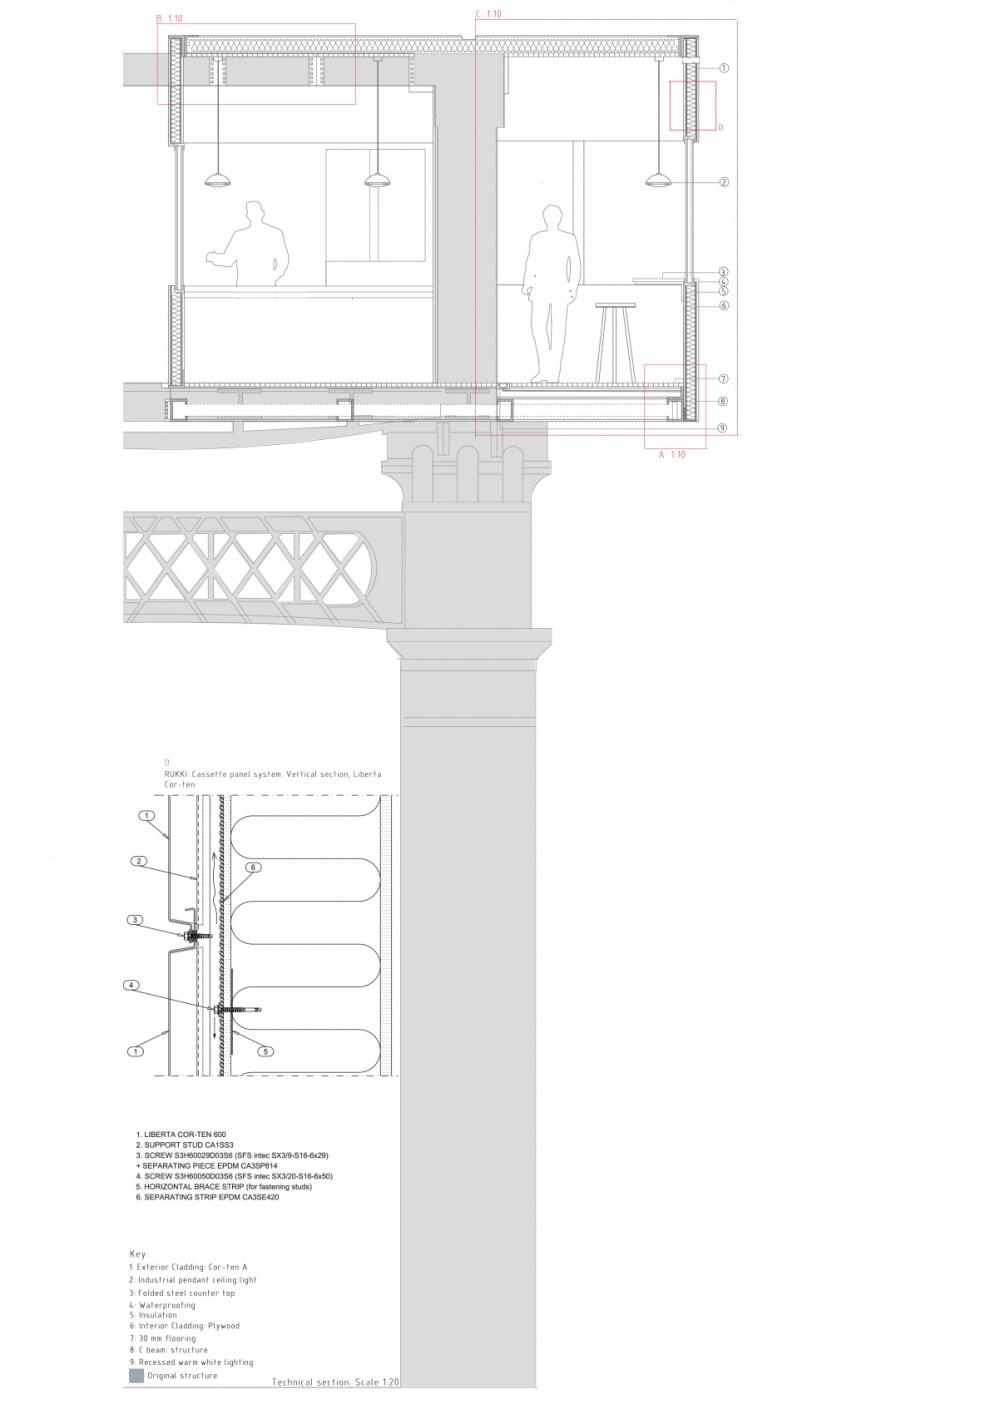 Marianne Khan Design - Technical section